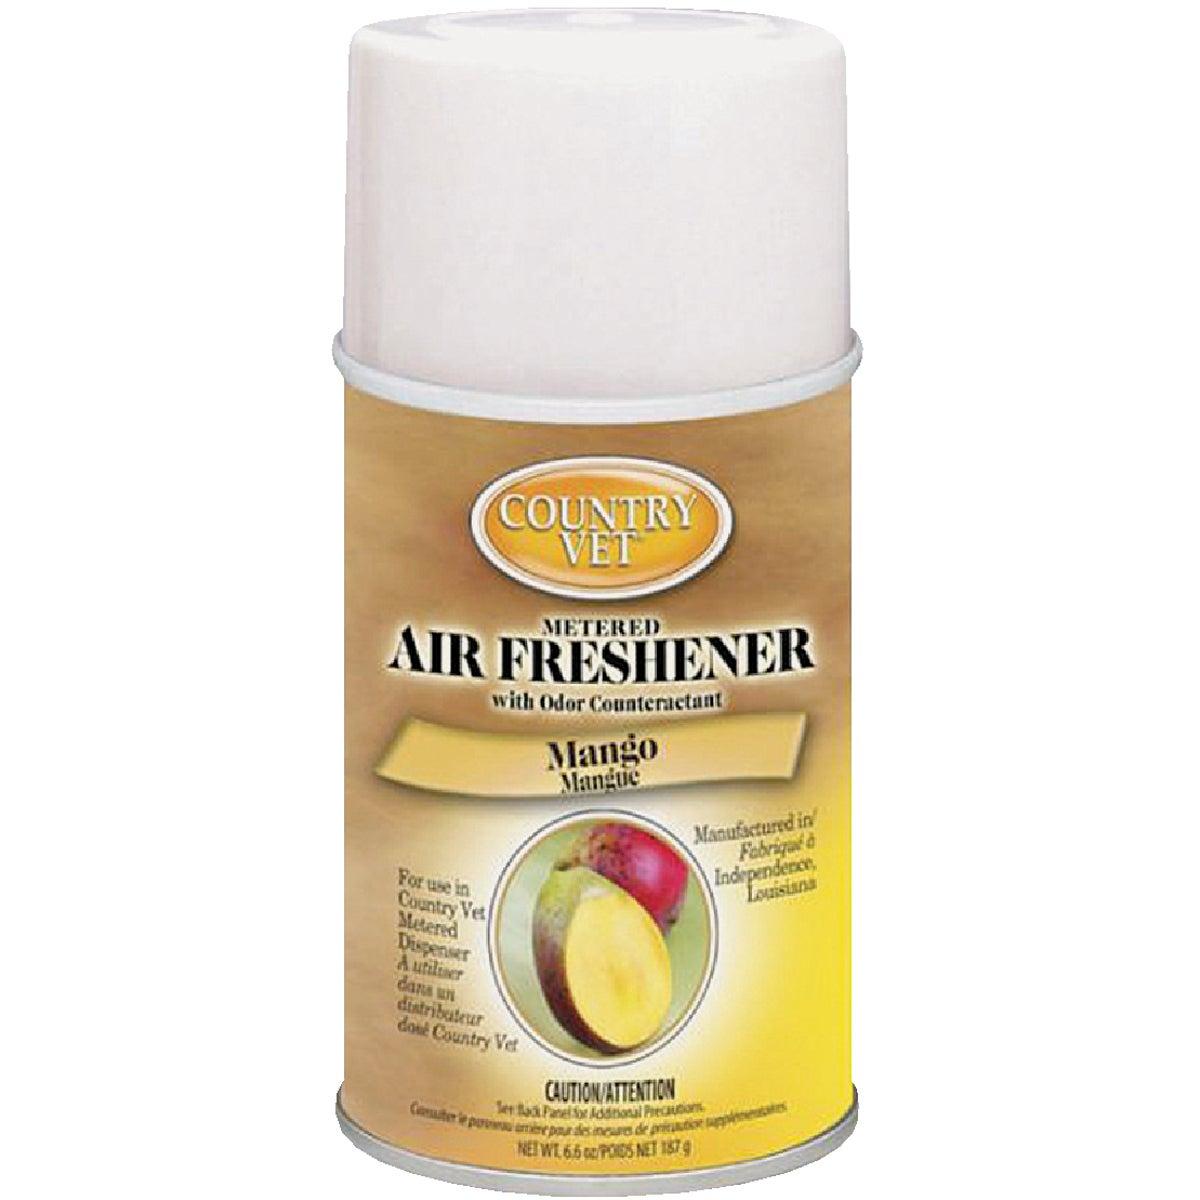 MANGO AIR FRESHENER